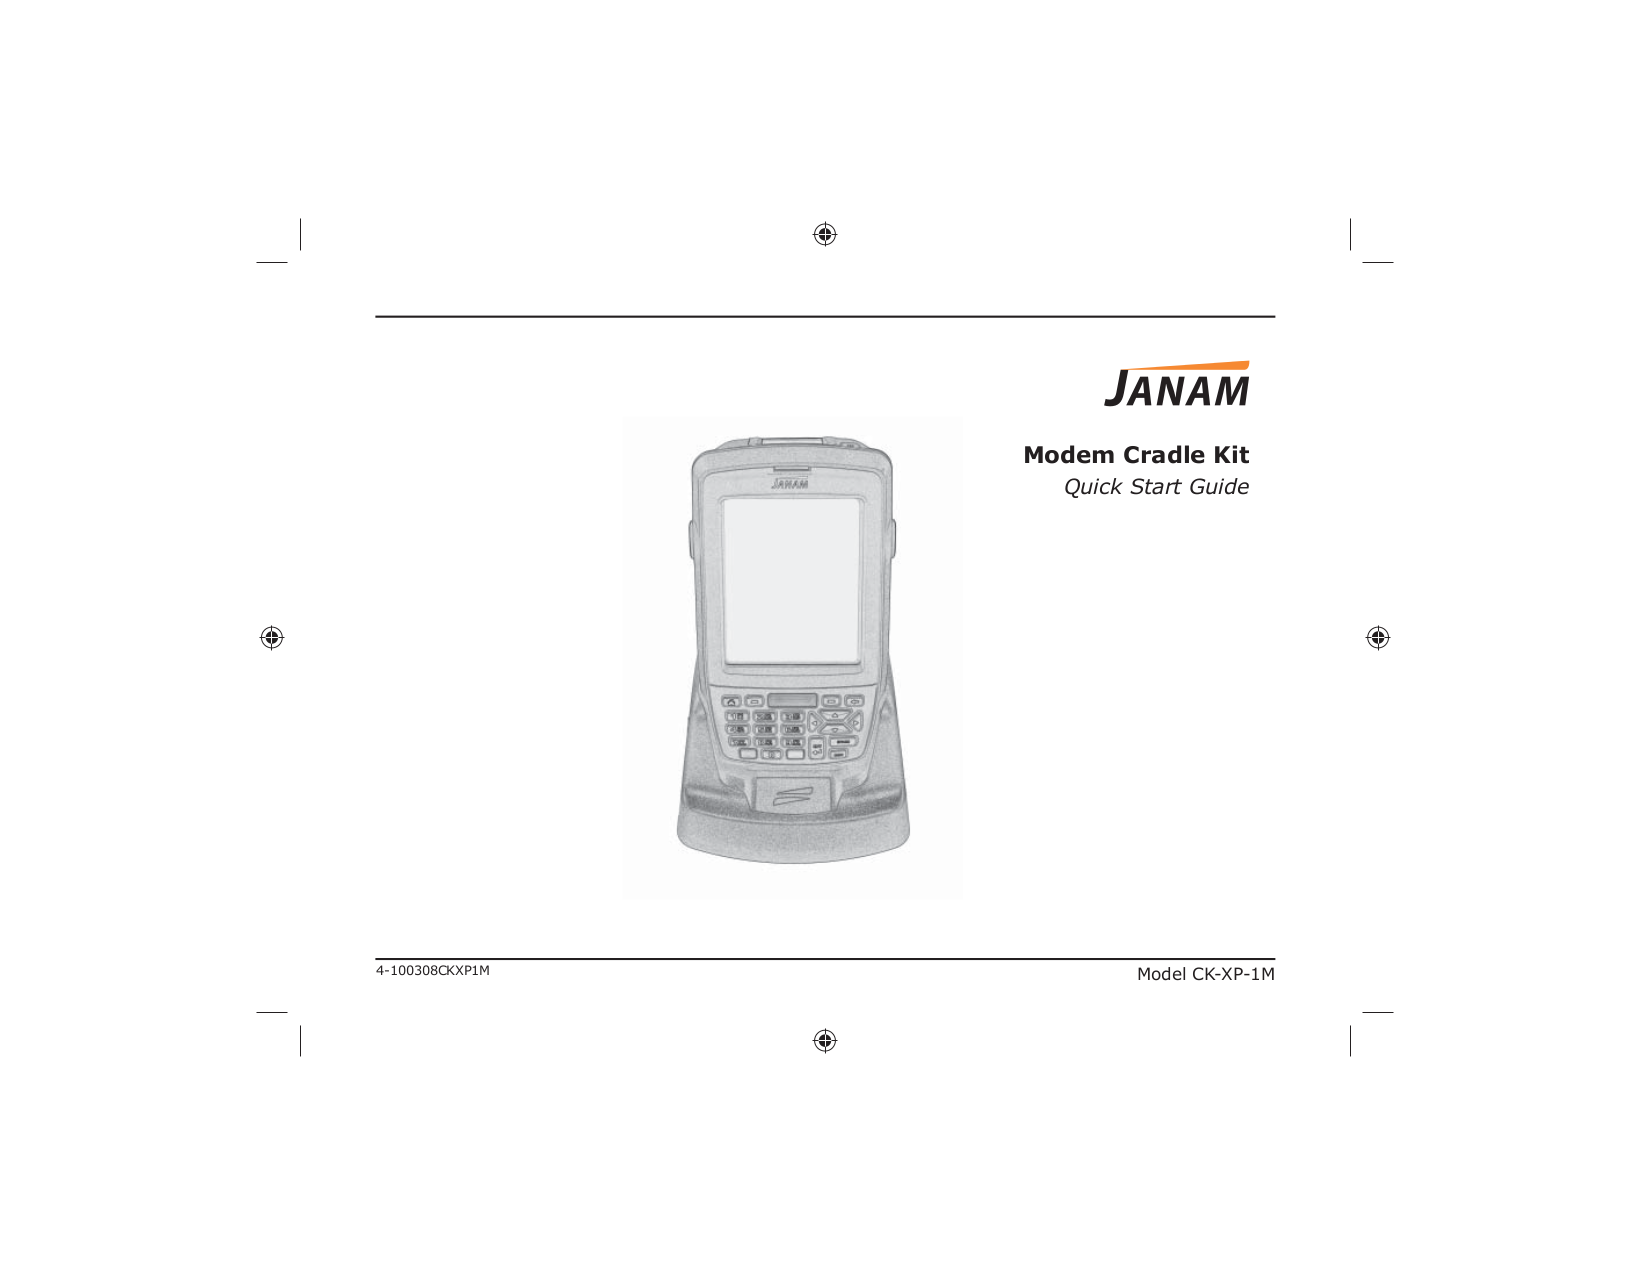 pdf for Janam Other CK-XP-1M Cradle Kit manual